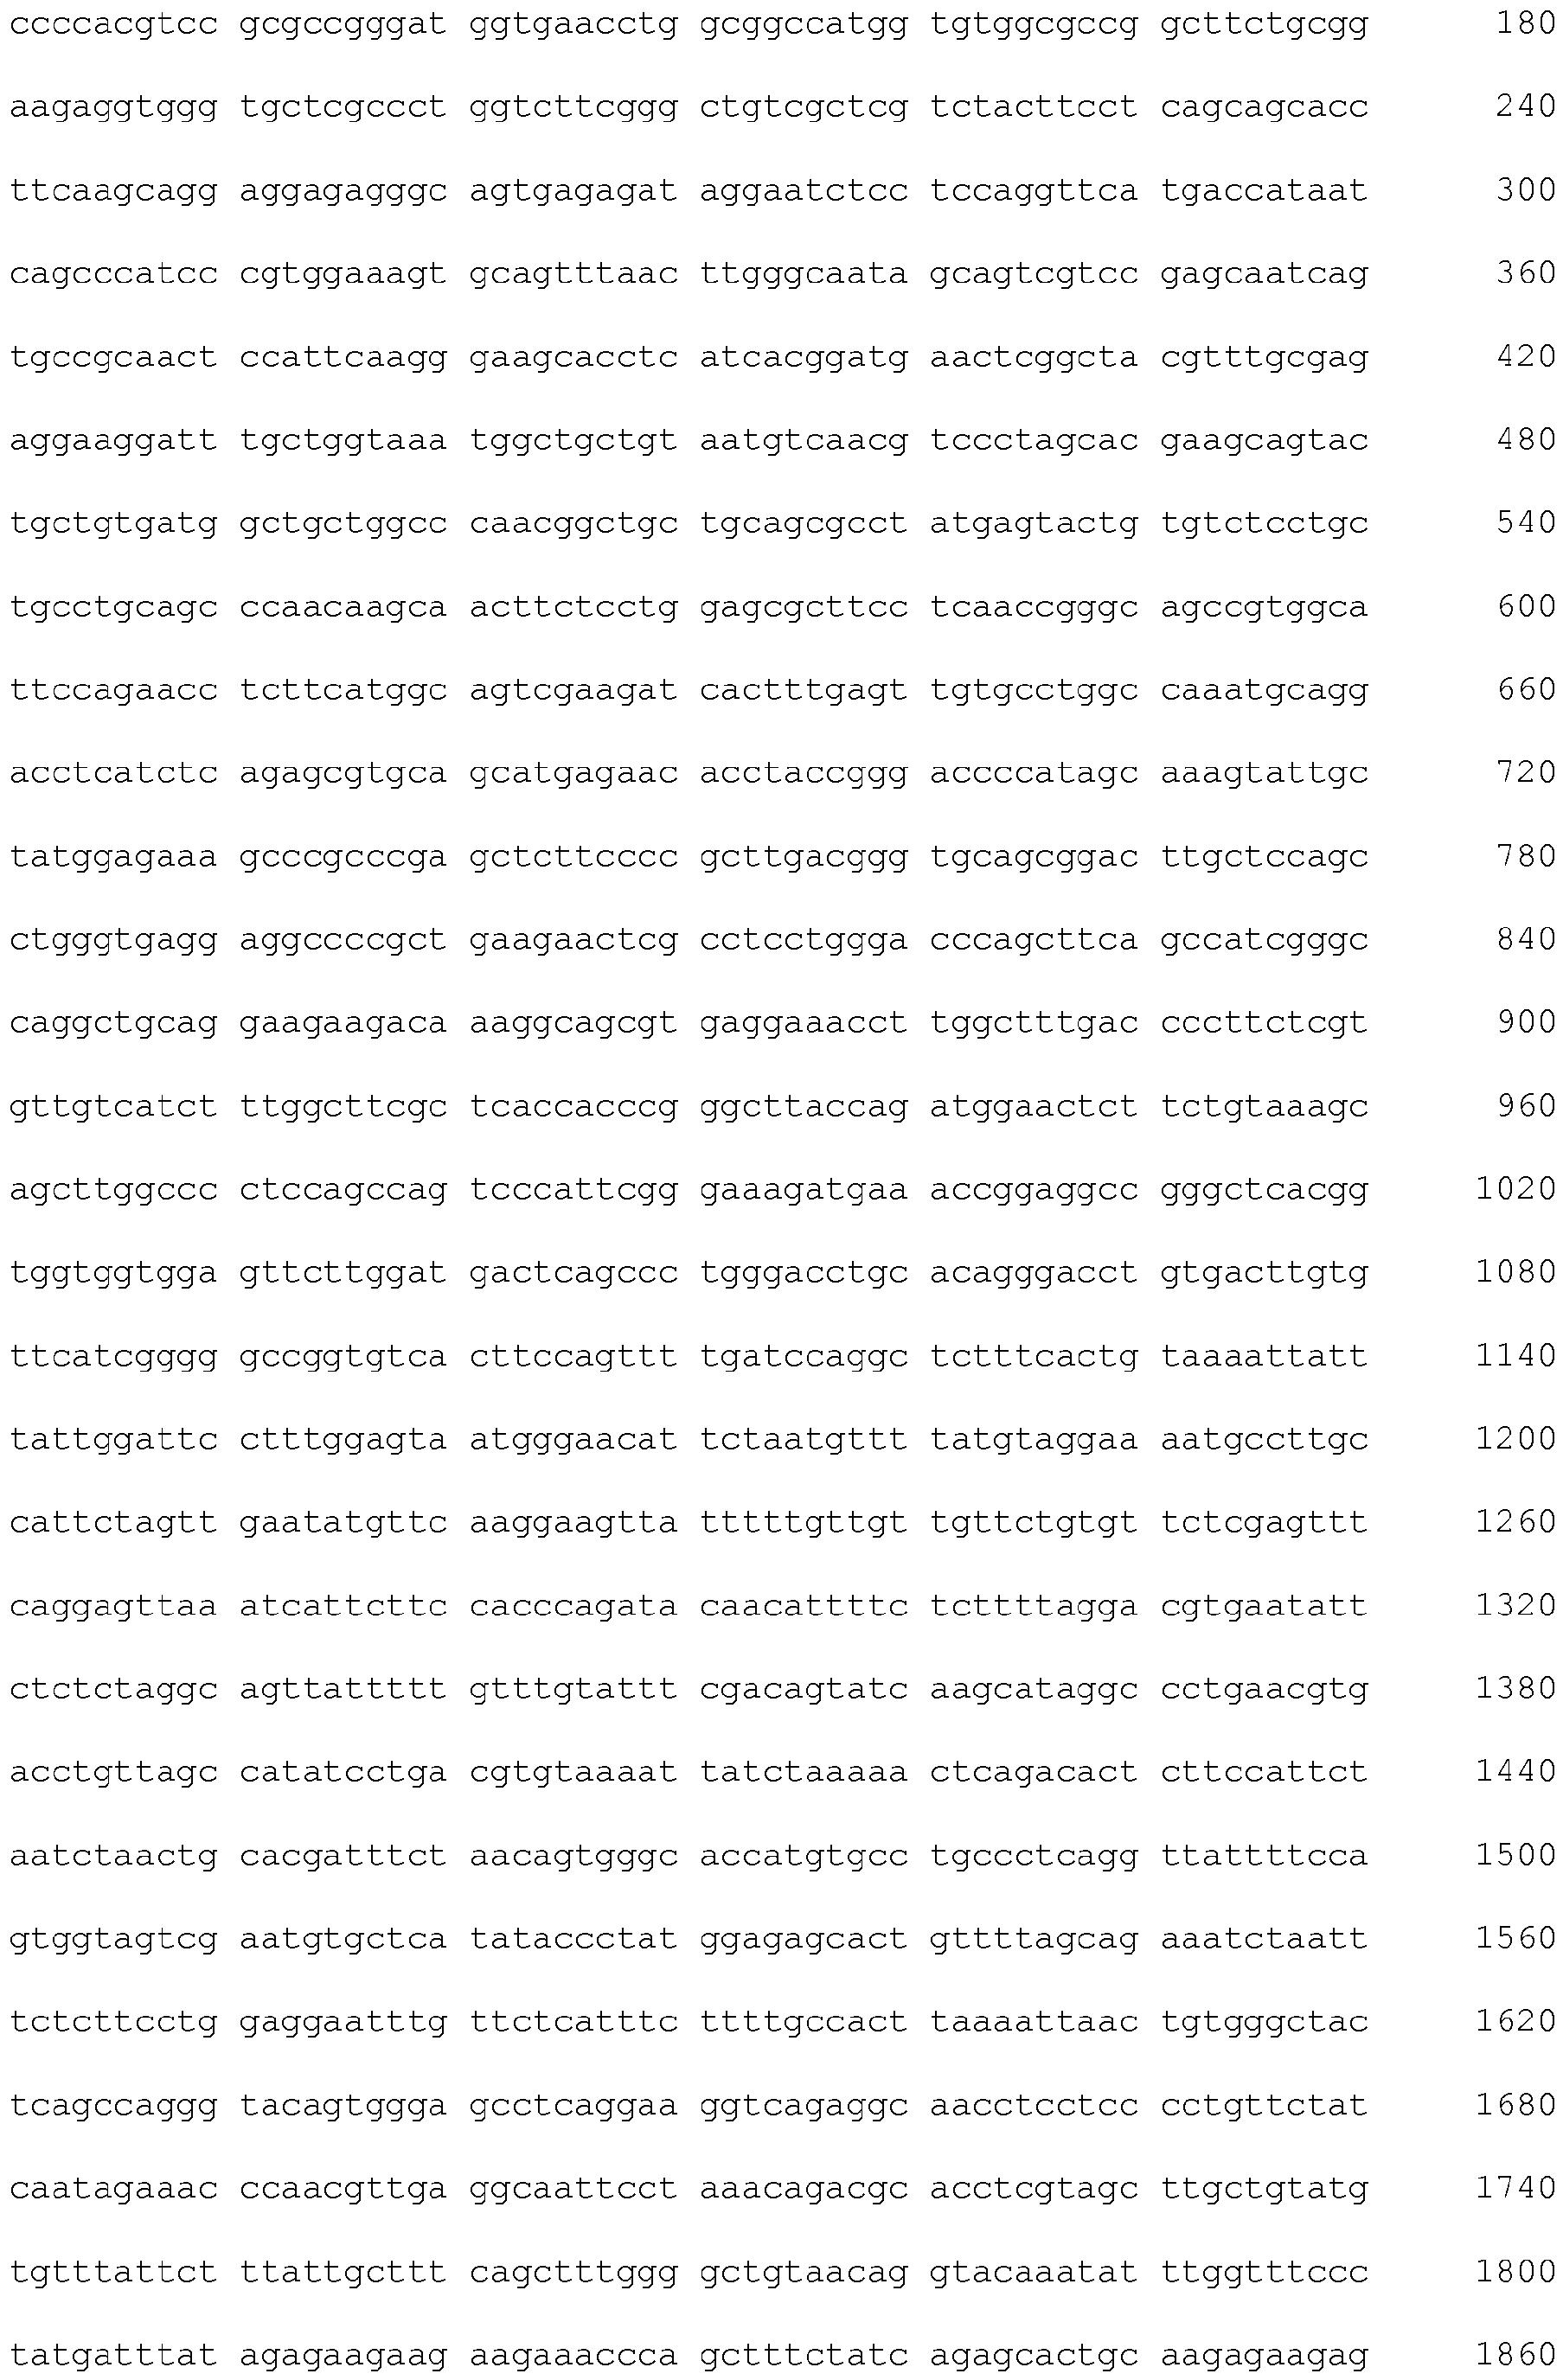 Figure imgb0189